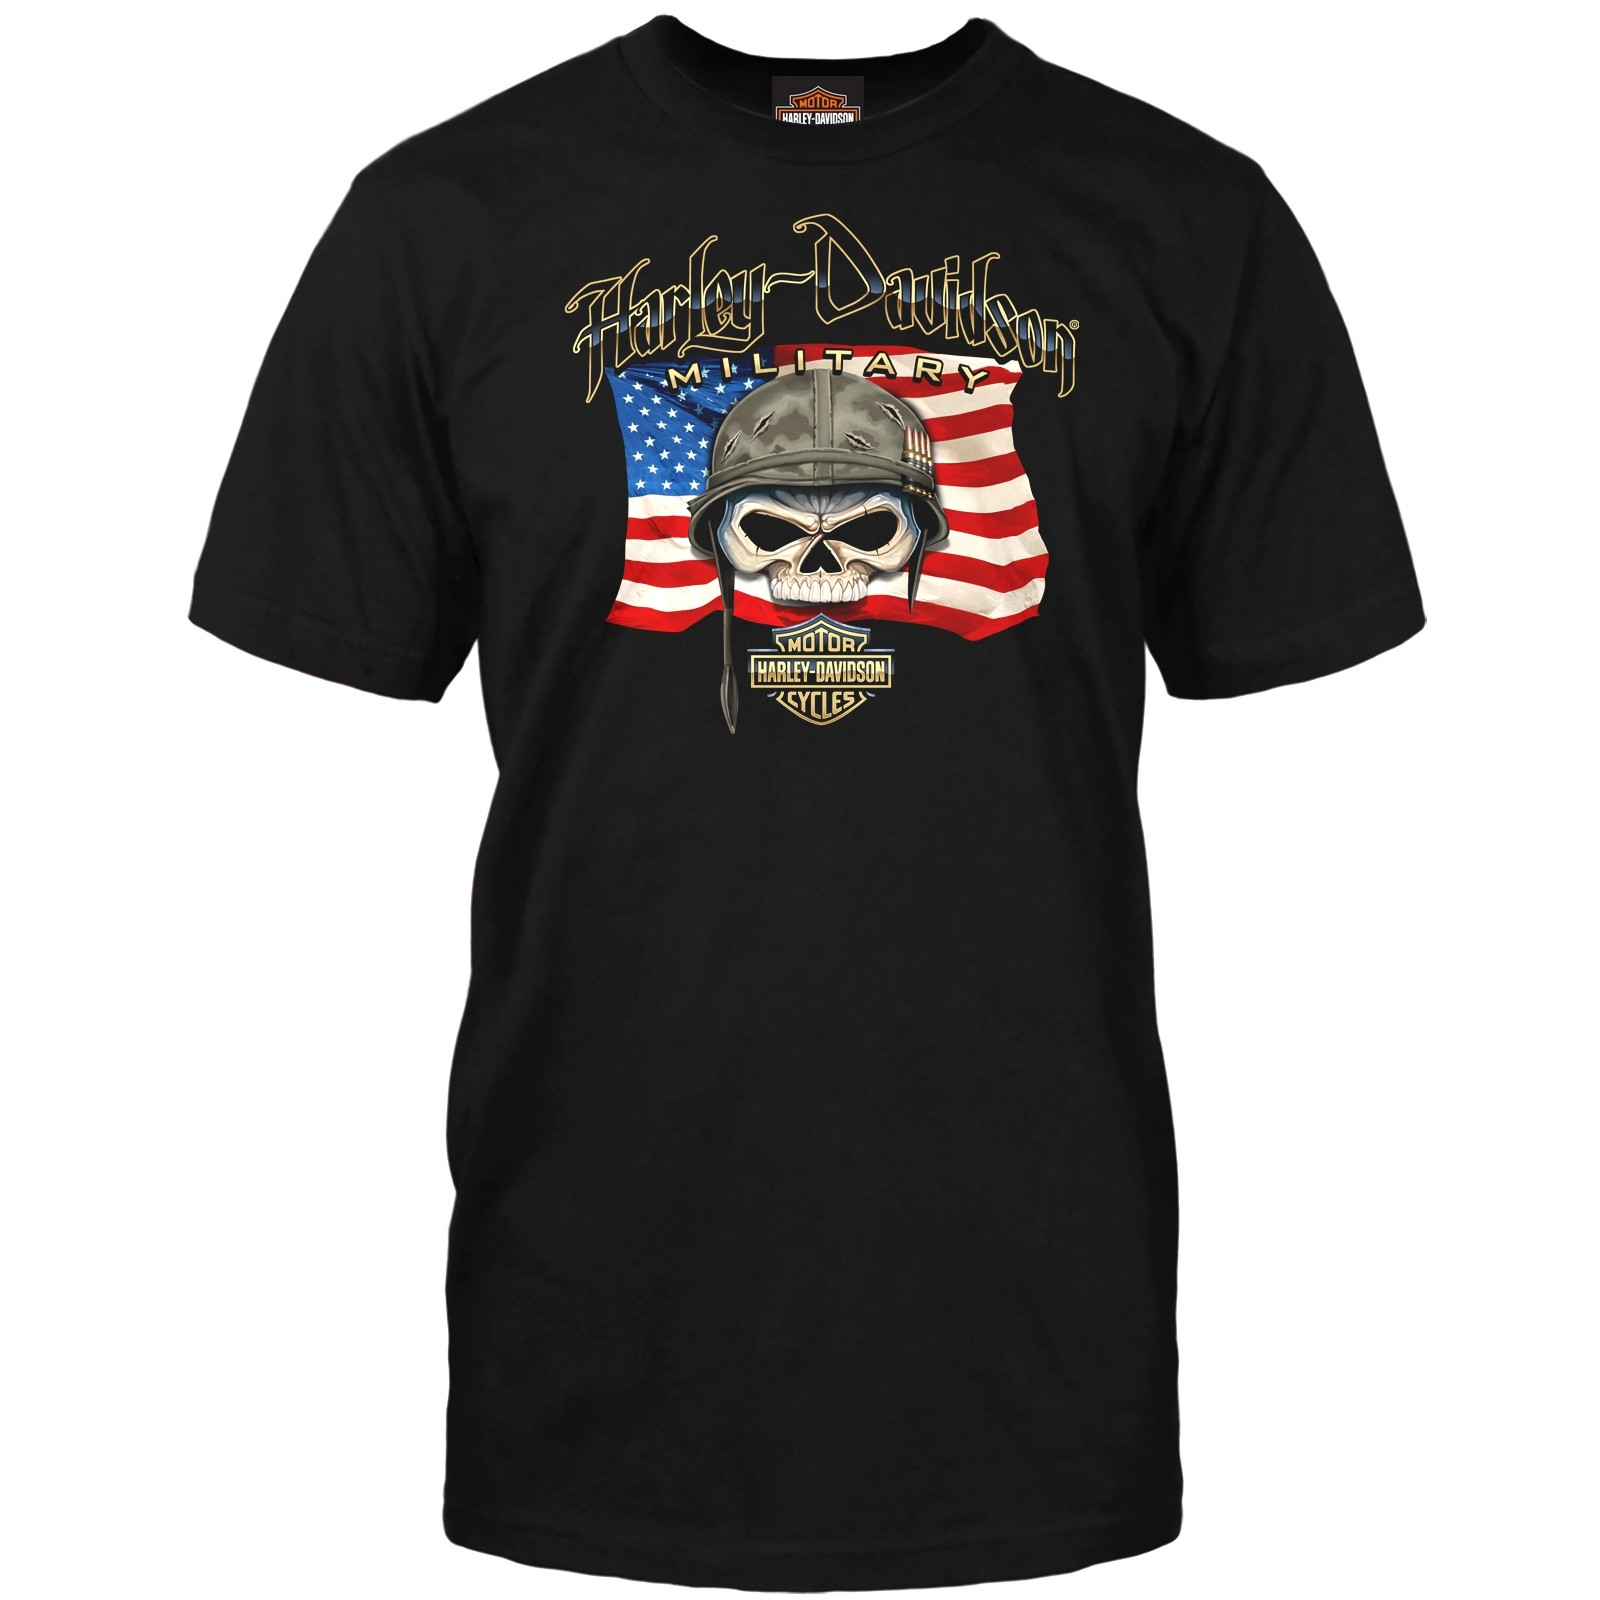 Men's Black Graphic T-Shirt | Overseas Tour - Willie G Flag